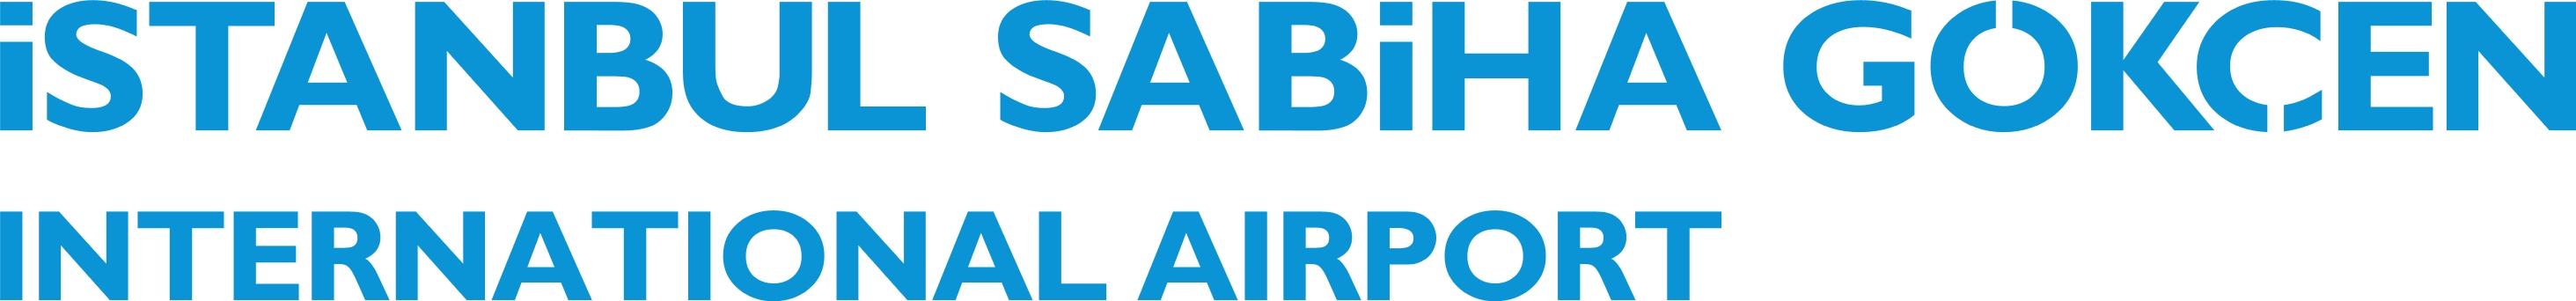 http://www.sabihagokcen.aero/files/logos/yanLogo_en.jpg